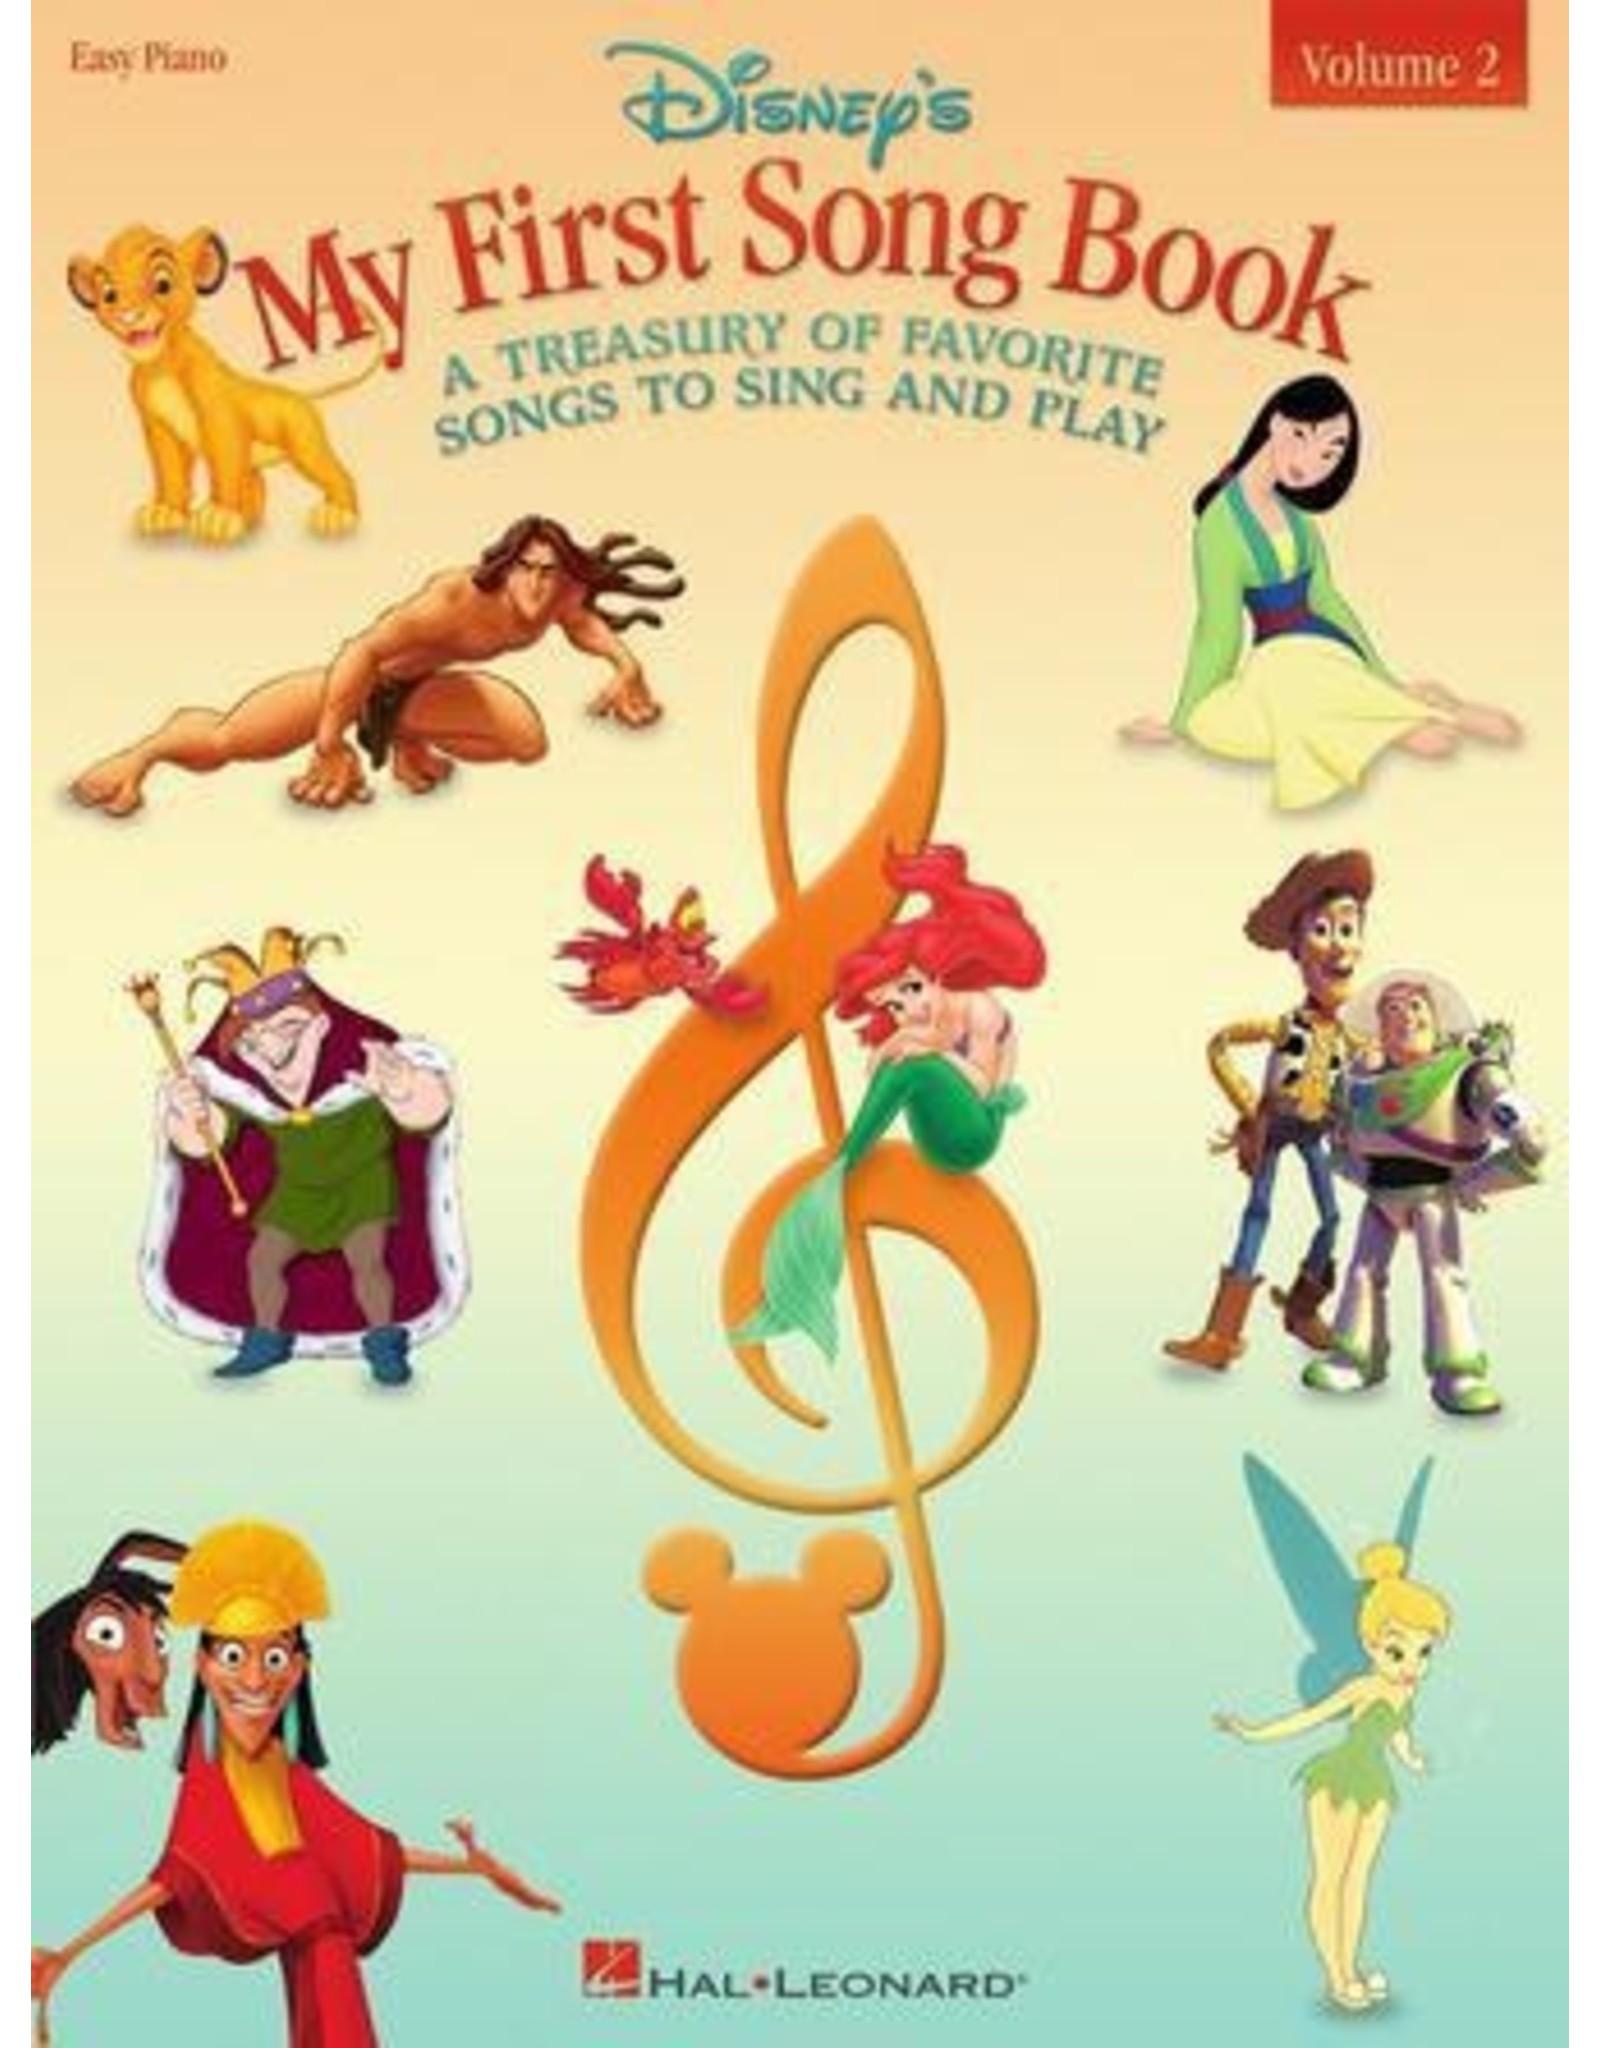 Hal Leonard Disney's My First Songbook Volume 2 Easy Piano